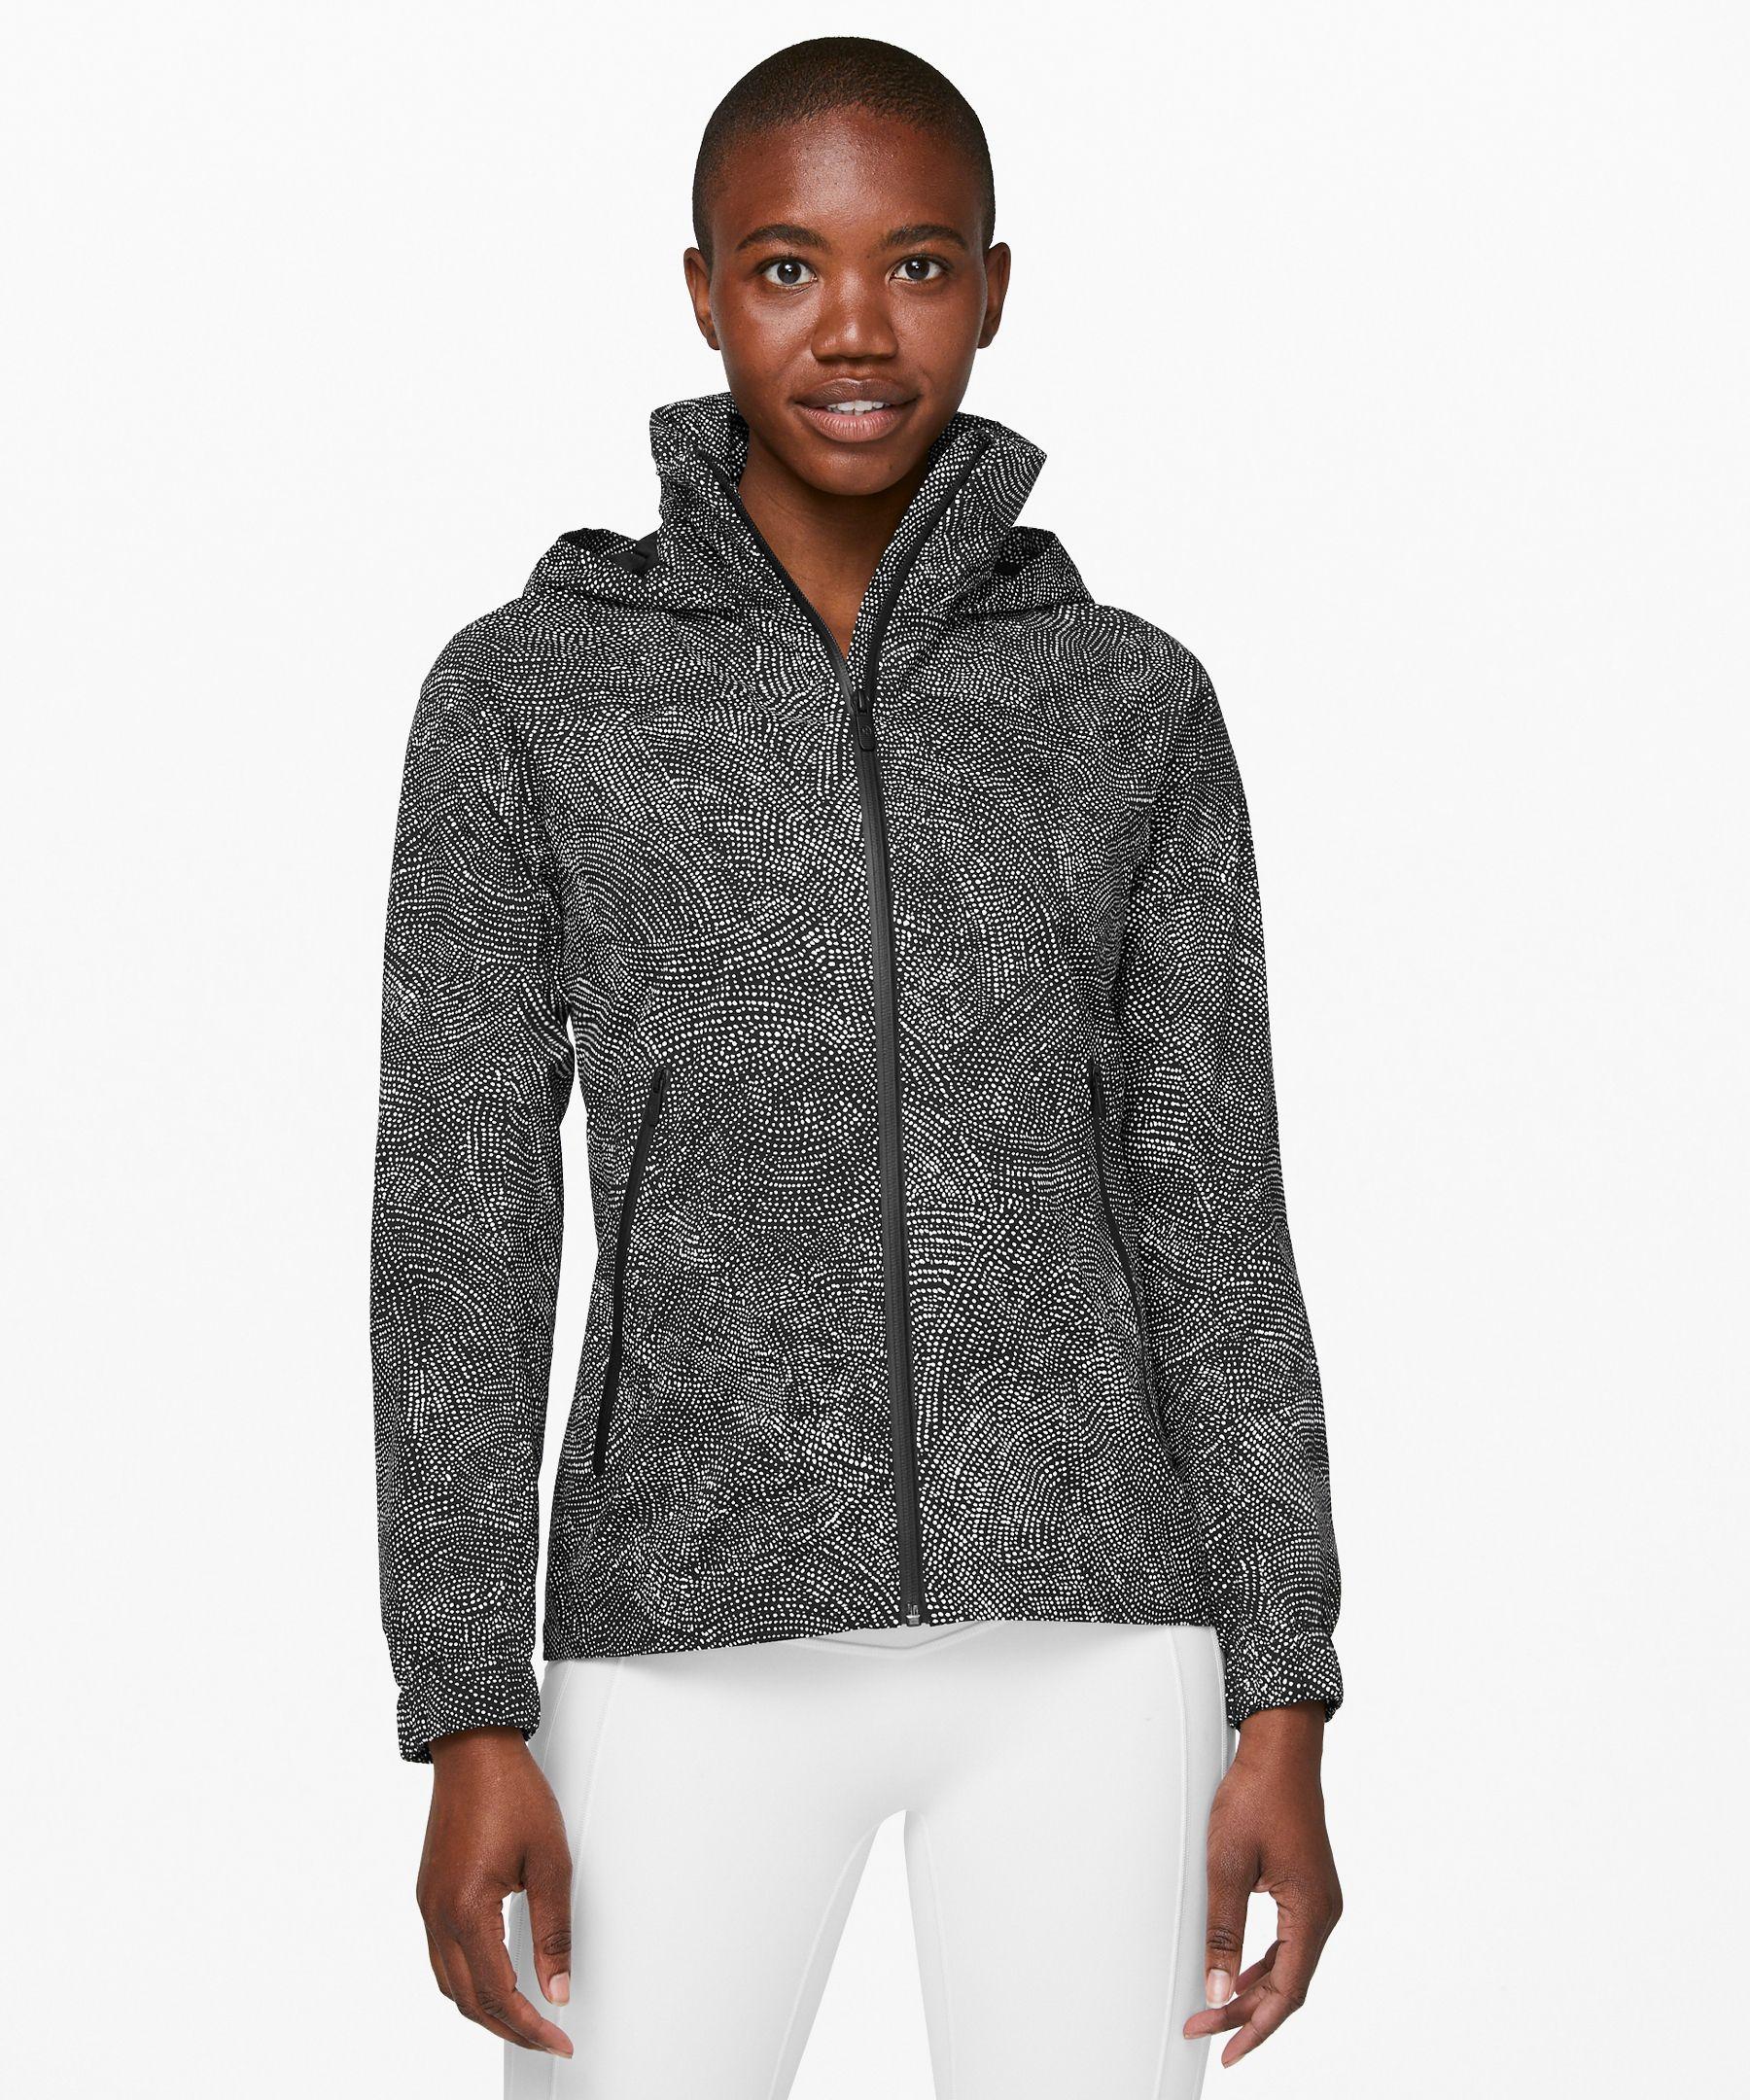 Lululemon Here To Move Jacket In Free Spirit Alpine White Black